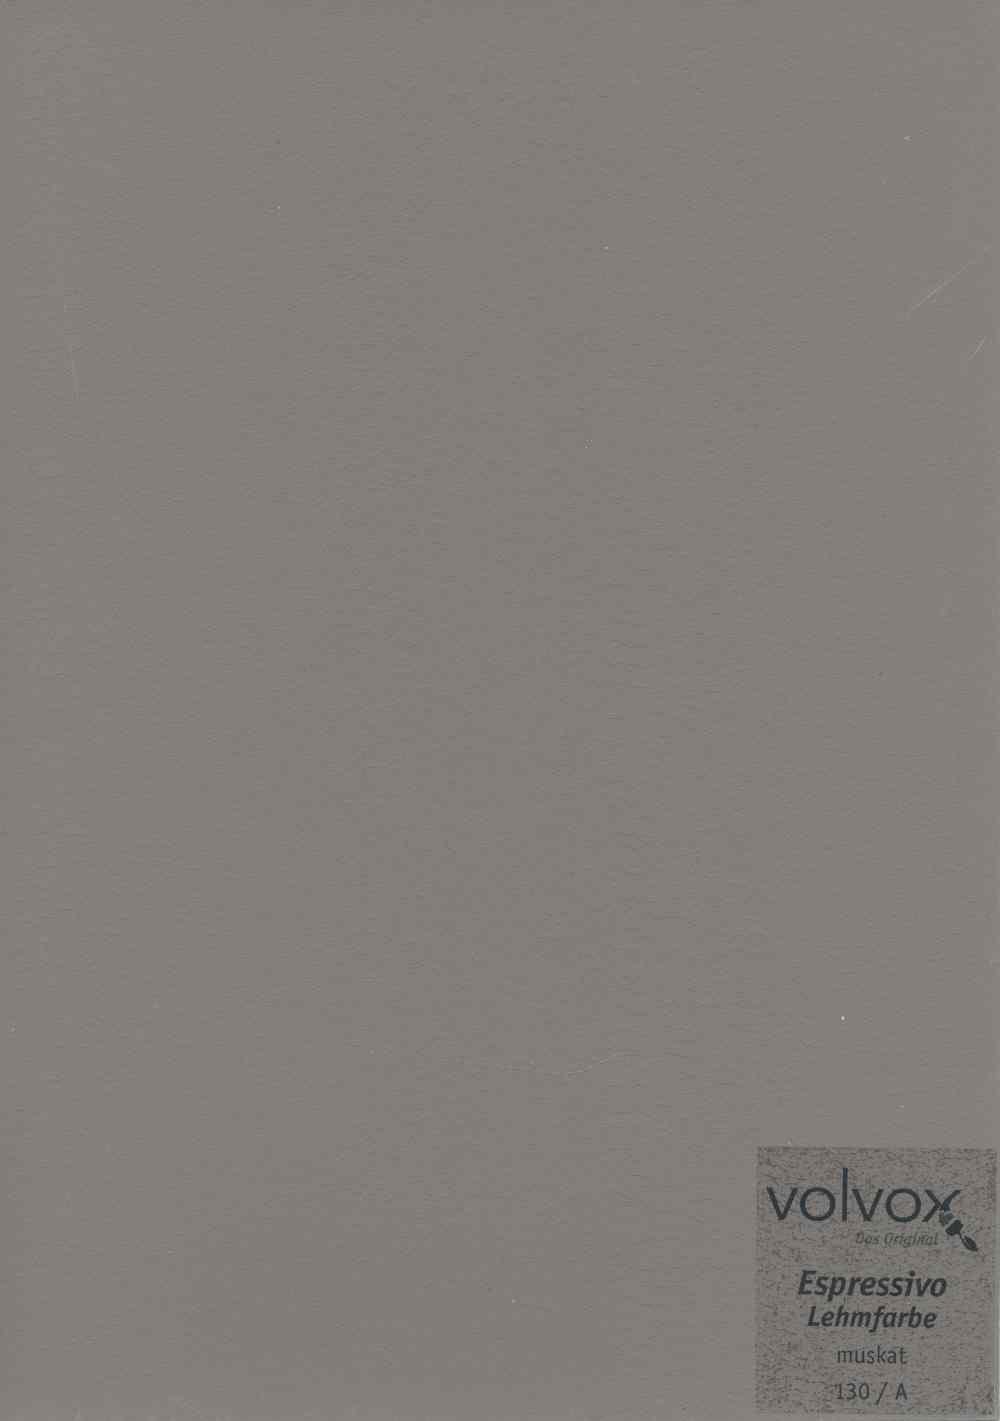 Volvox Espressivo Lehmfarbe 130 muskat